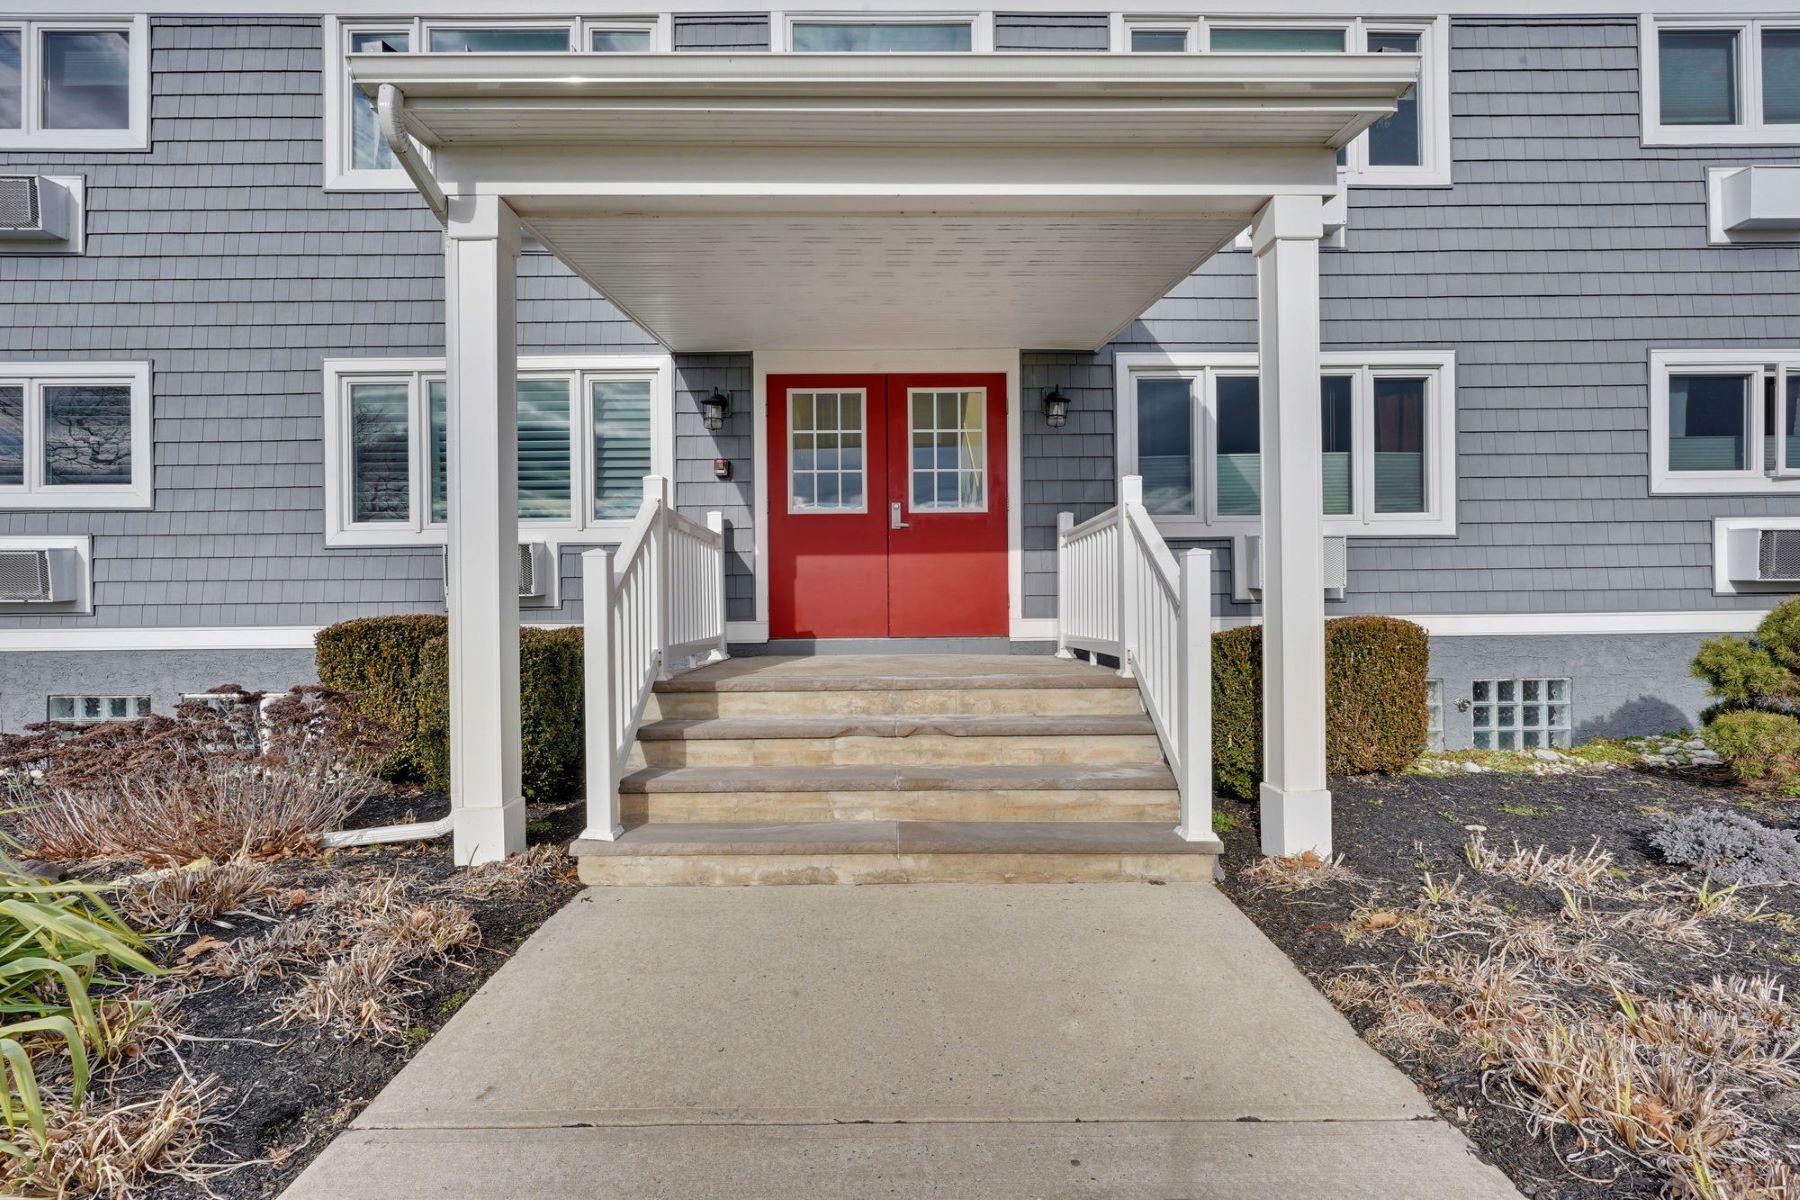 Condominiums для того Продажа на Exceptional Location with Stunning Views 210 5th Avenue 18, Belmar, Нью-Джерси 07719 Соединенные Штаты